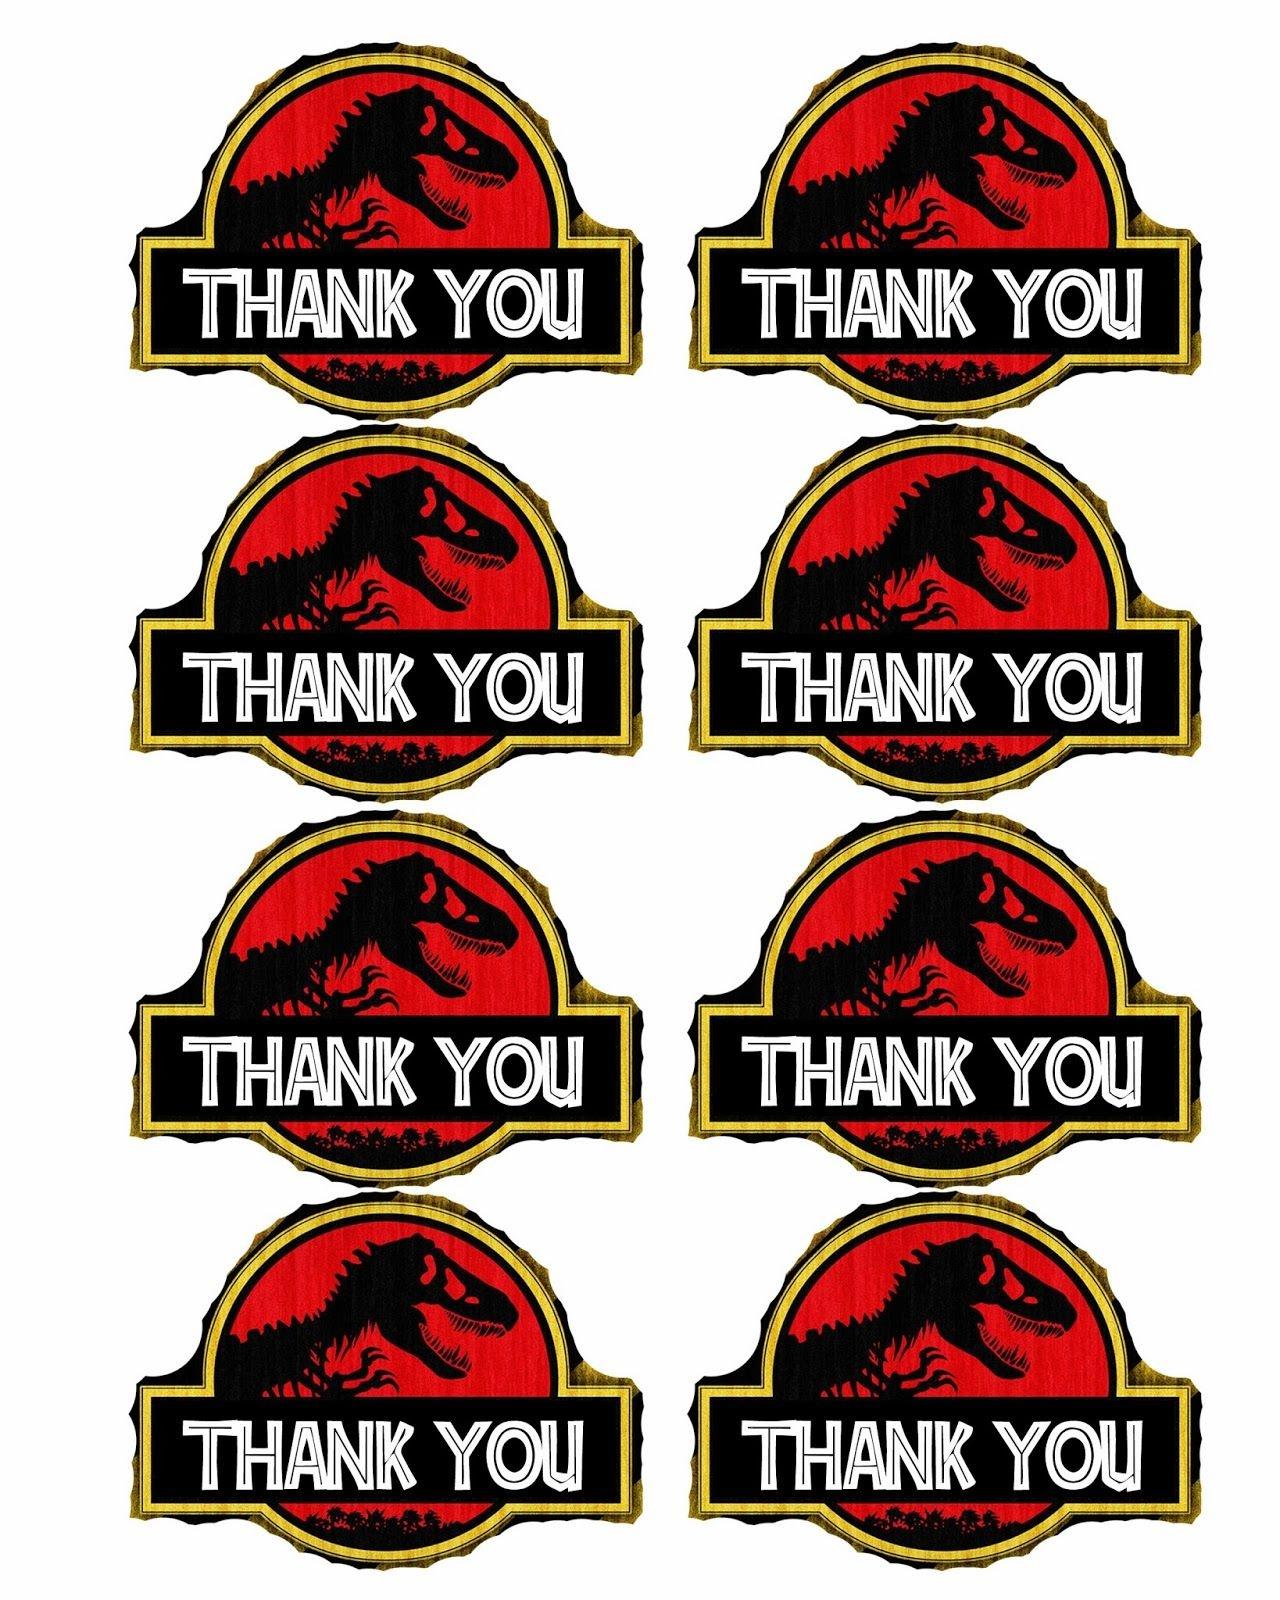 Bringing Home Ezra: Free Dinosaur (Jurrasic Park) Party Printables - Jurassic World Free Printables